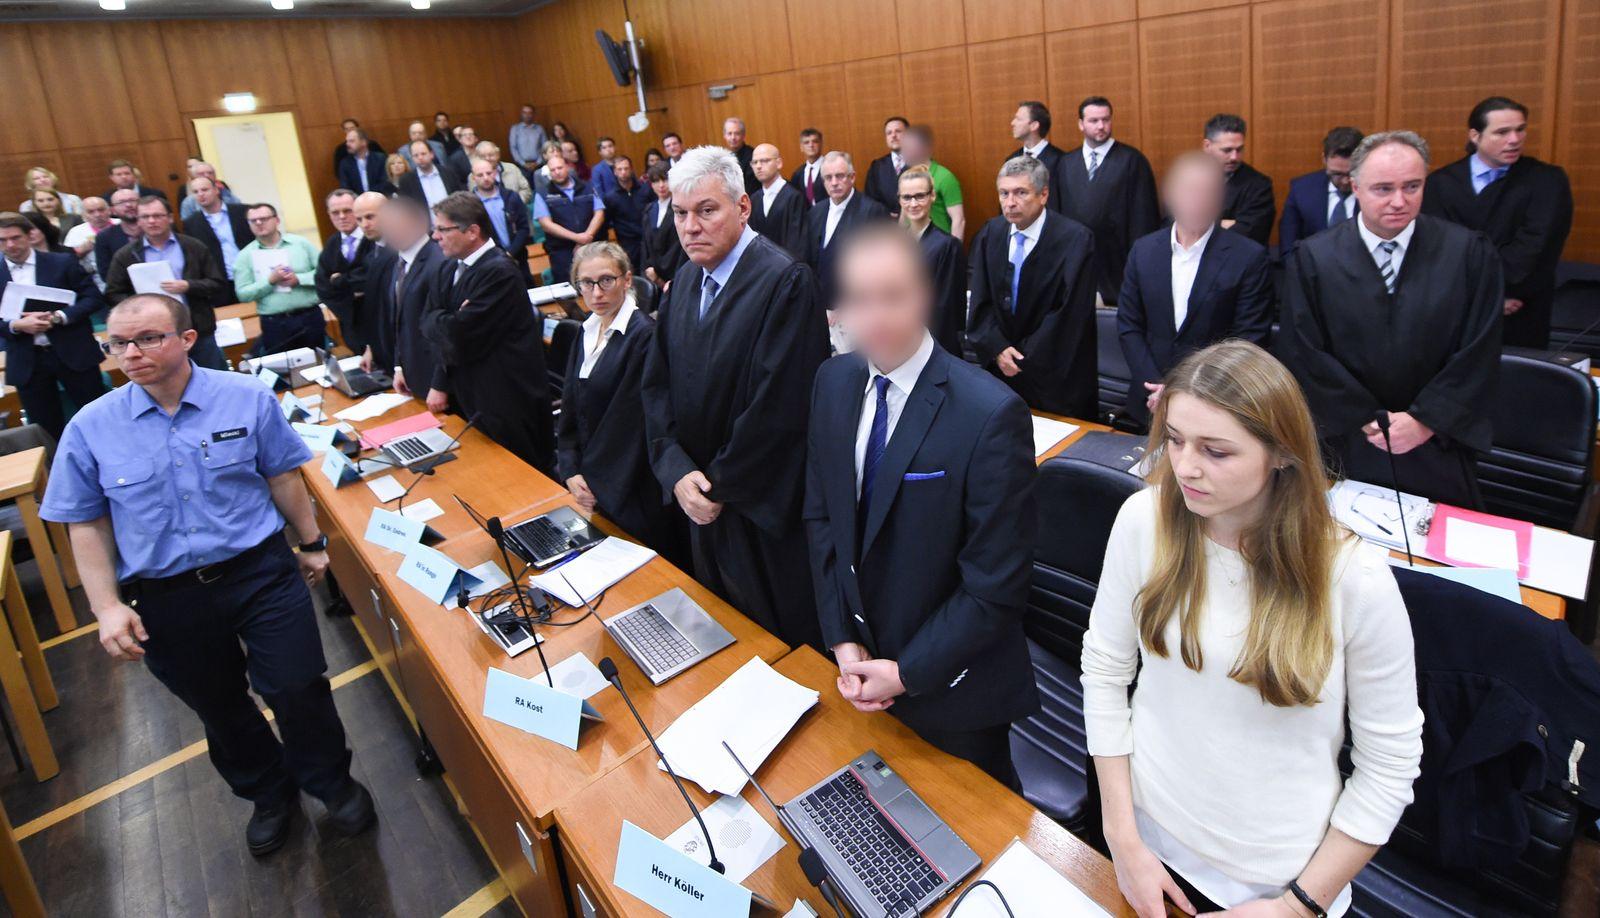 S&K-Betrugsprozess in Frankfurt